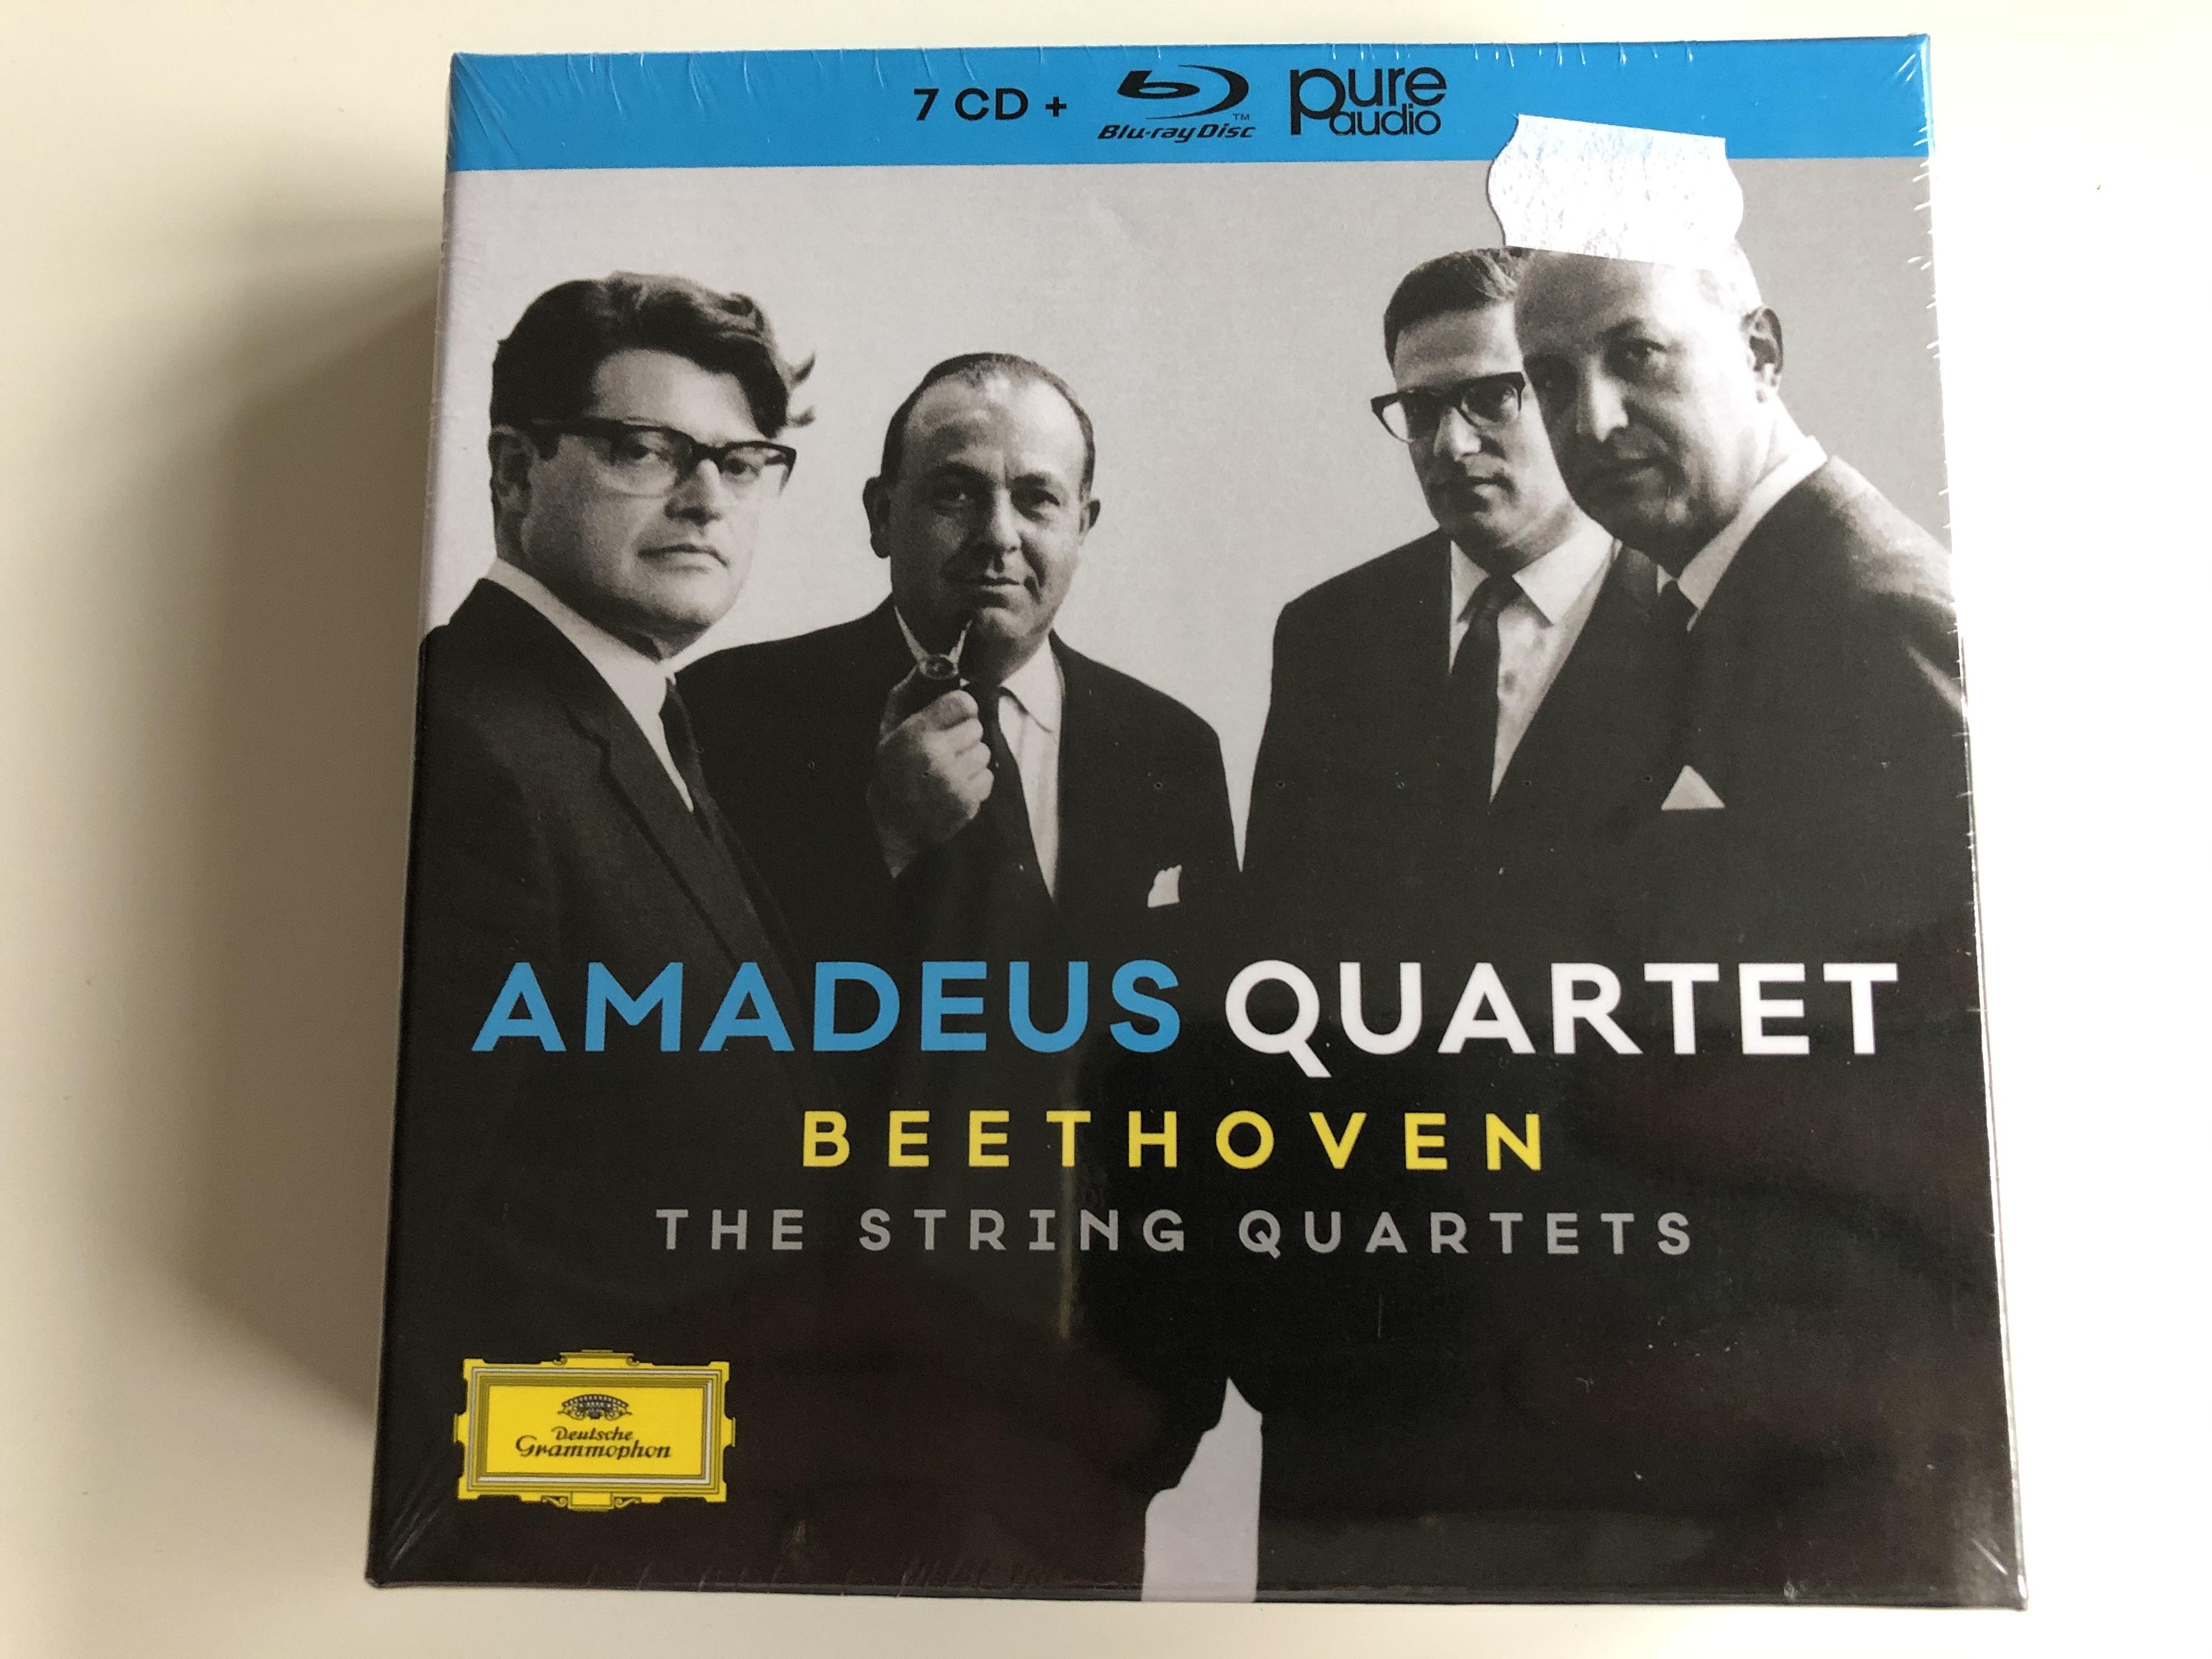 amadeus-quartet-beethoven-the-string-quartets-deutsche-grammophon-7x-audio-cd-2018-00289-483-5645-1-.jpg